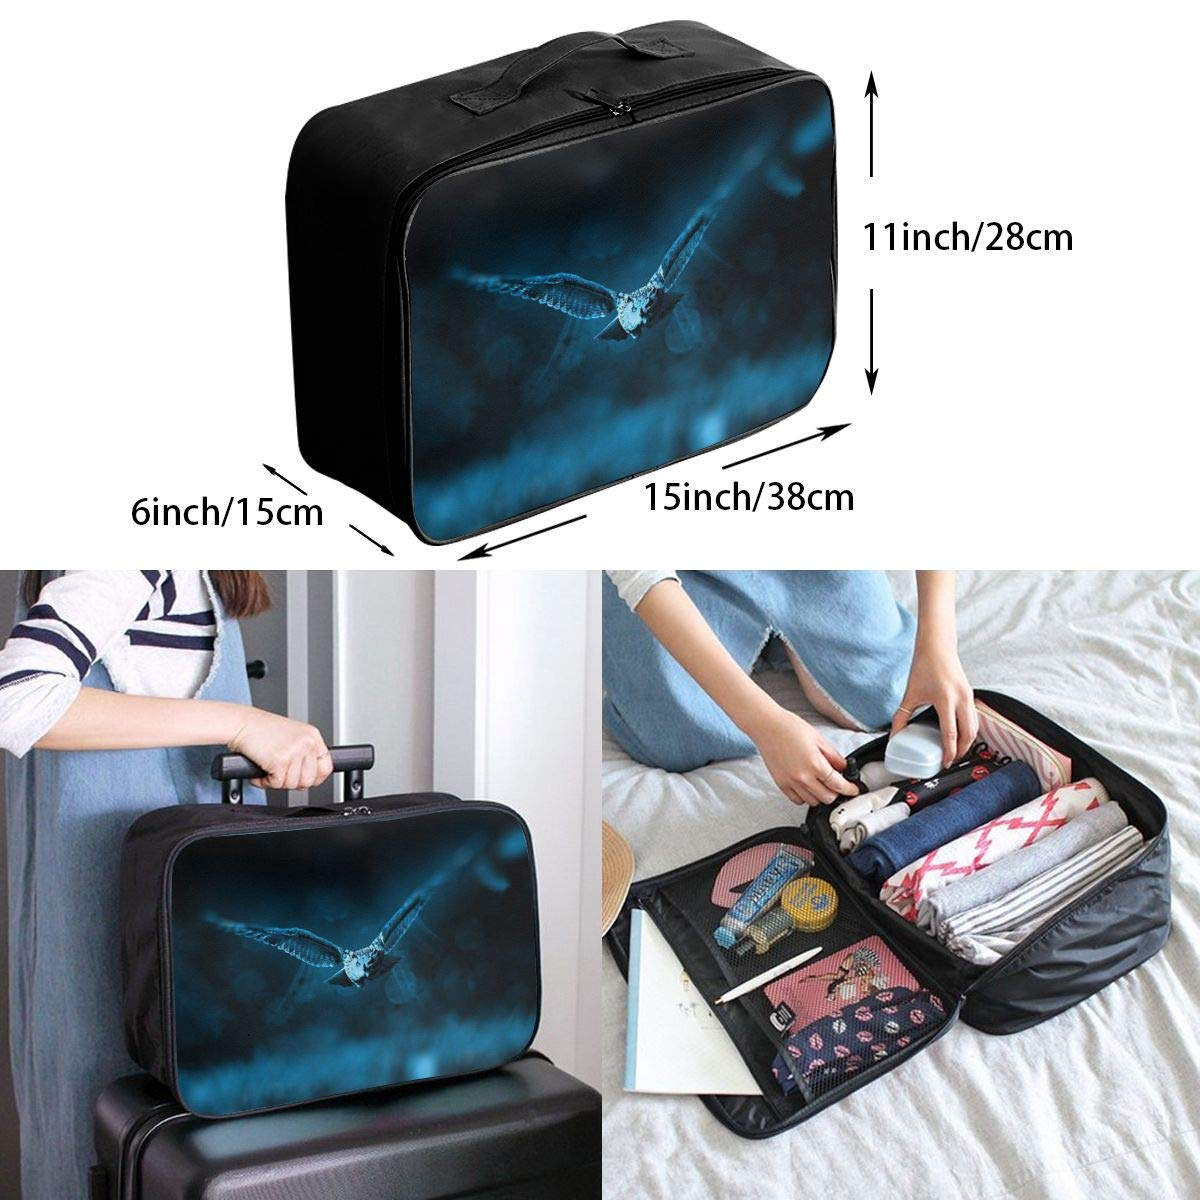 Canvas Travel Weekender Bag,Fashion Custom Lightweight Large Capacity Portable Luggage Bag,Suitcase Trolley Bag 7 ADGAI Owl Series